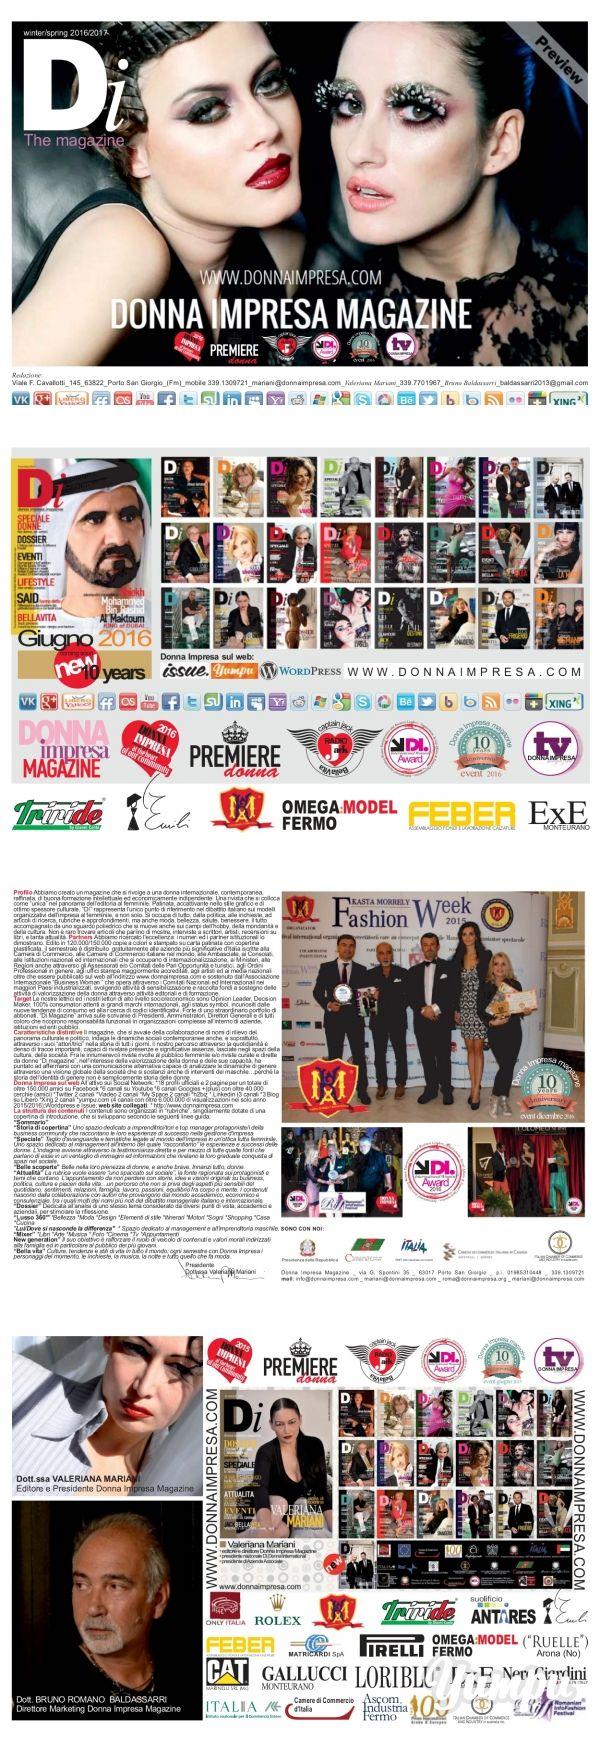 DONNA IMPRESA MAGAZINE 2016 - 2017. - Magazine with 18 pages: